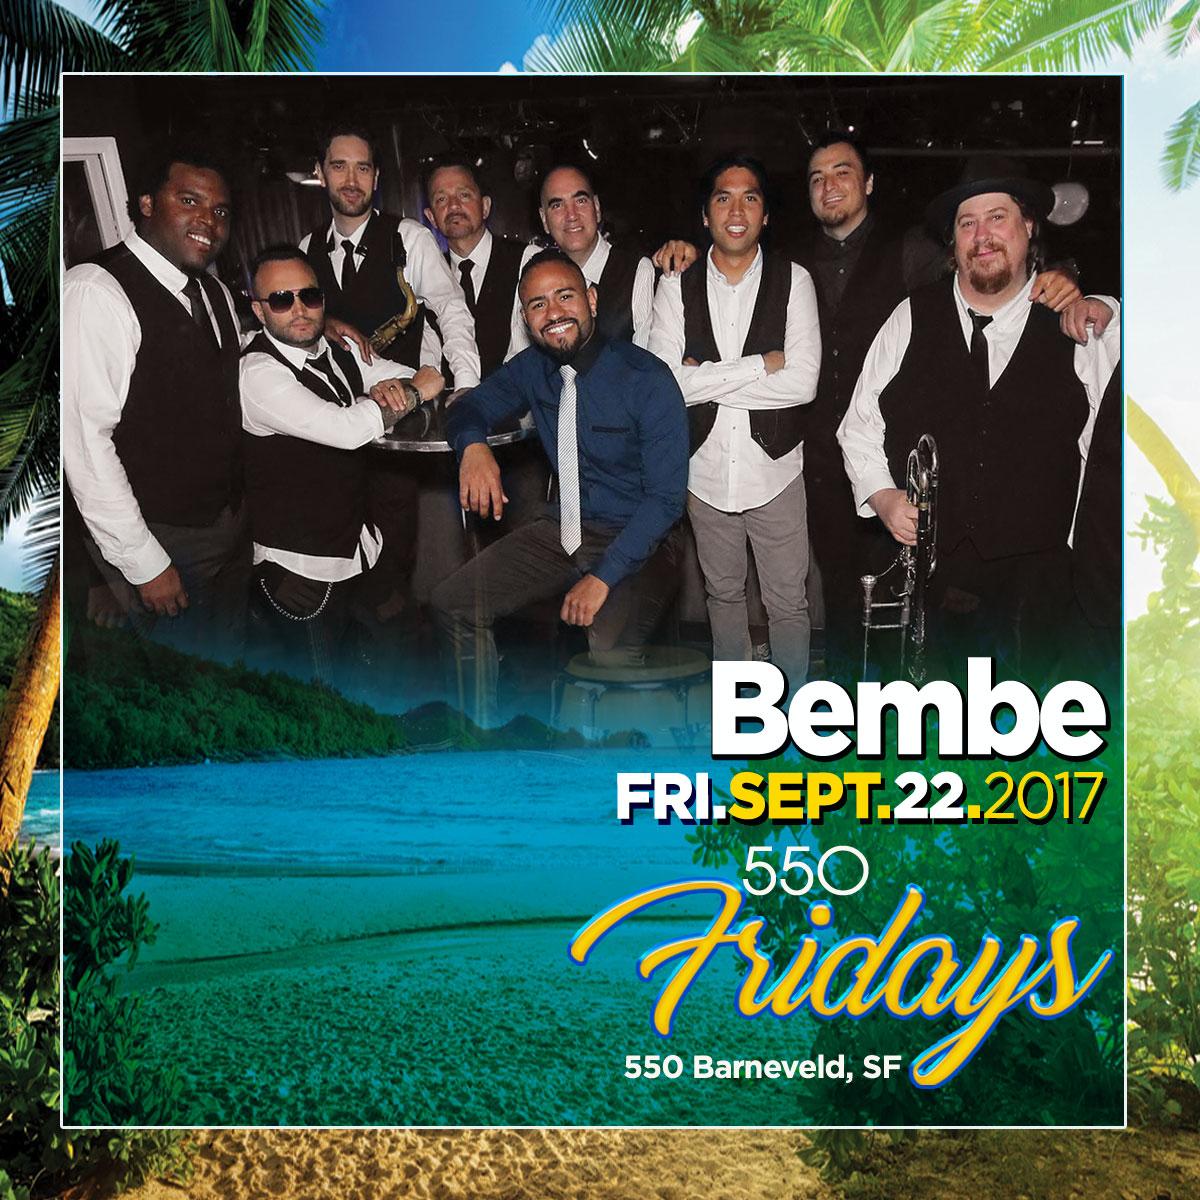 Dance Fridays, 550 Barneveld, SF, 21+. Salsa, Bachata y Mas, Dance Lessons at 8p